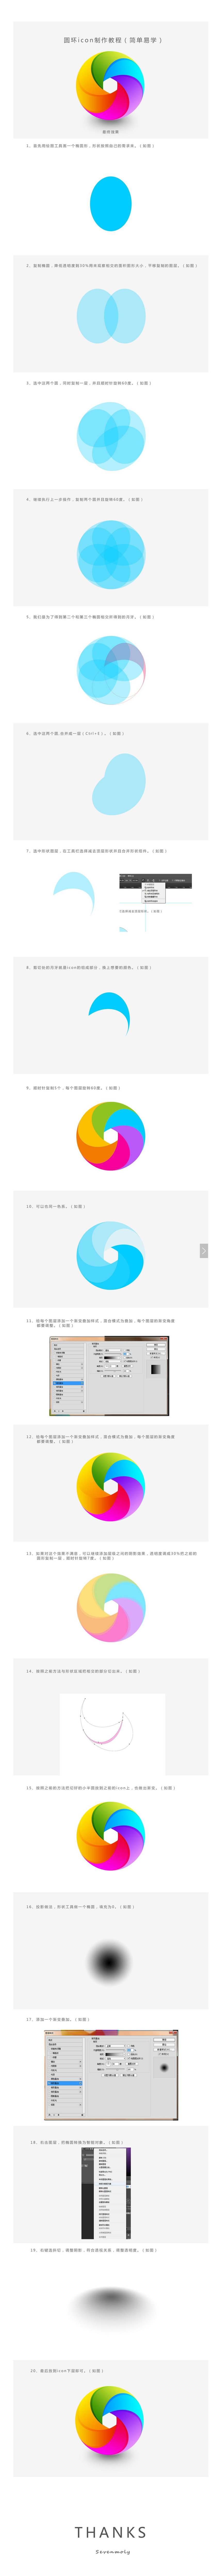 PS教程:绘制一个多彩圆环图标 PS教程:绘制一个多彩圆环图标 Photoshop